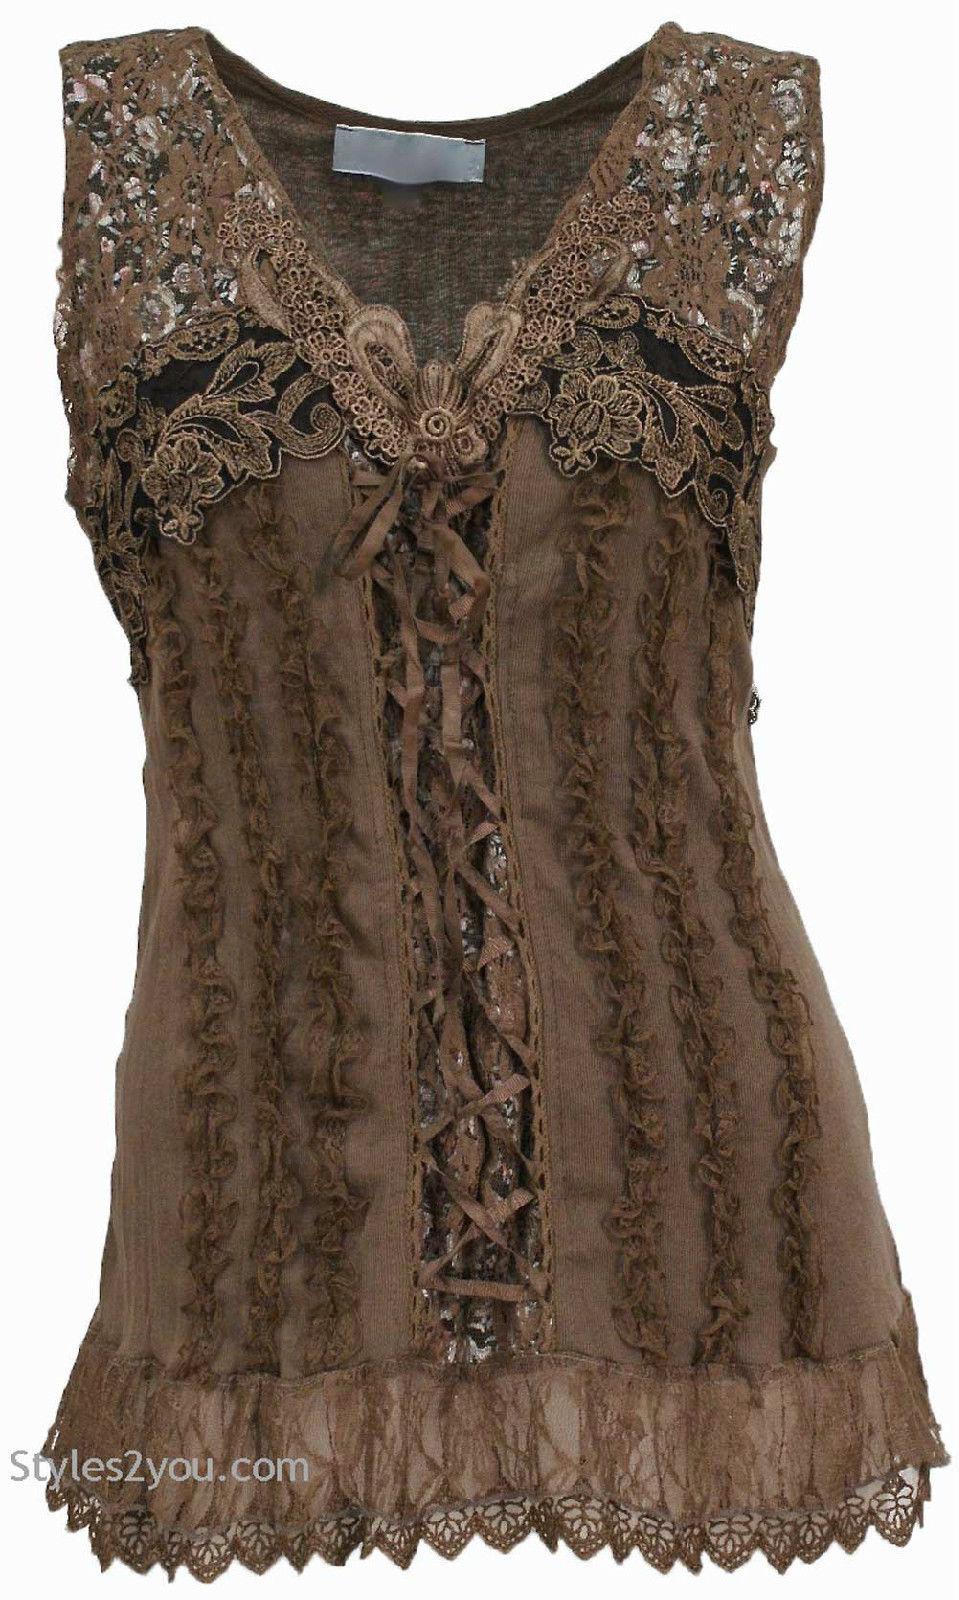 Mercer Womens Vintage Corset Top In Brown ANTS67642BR